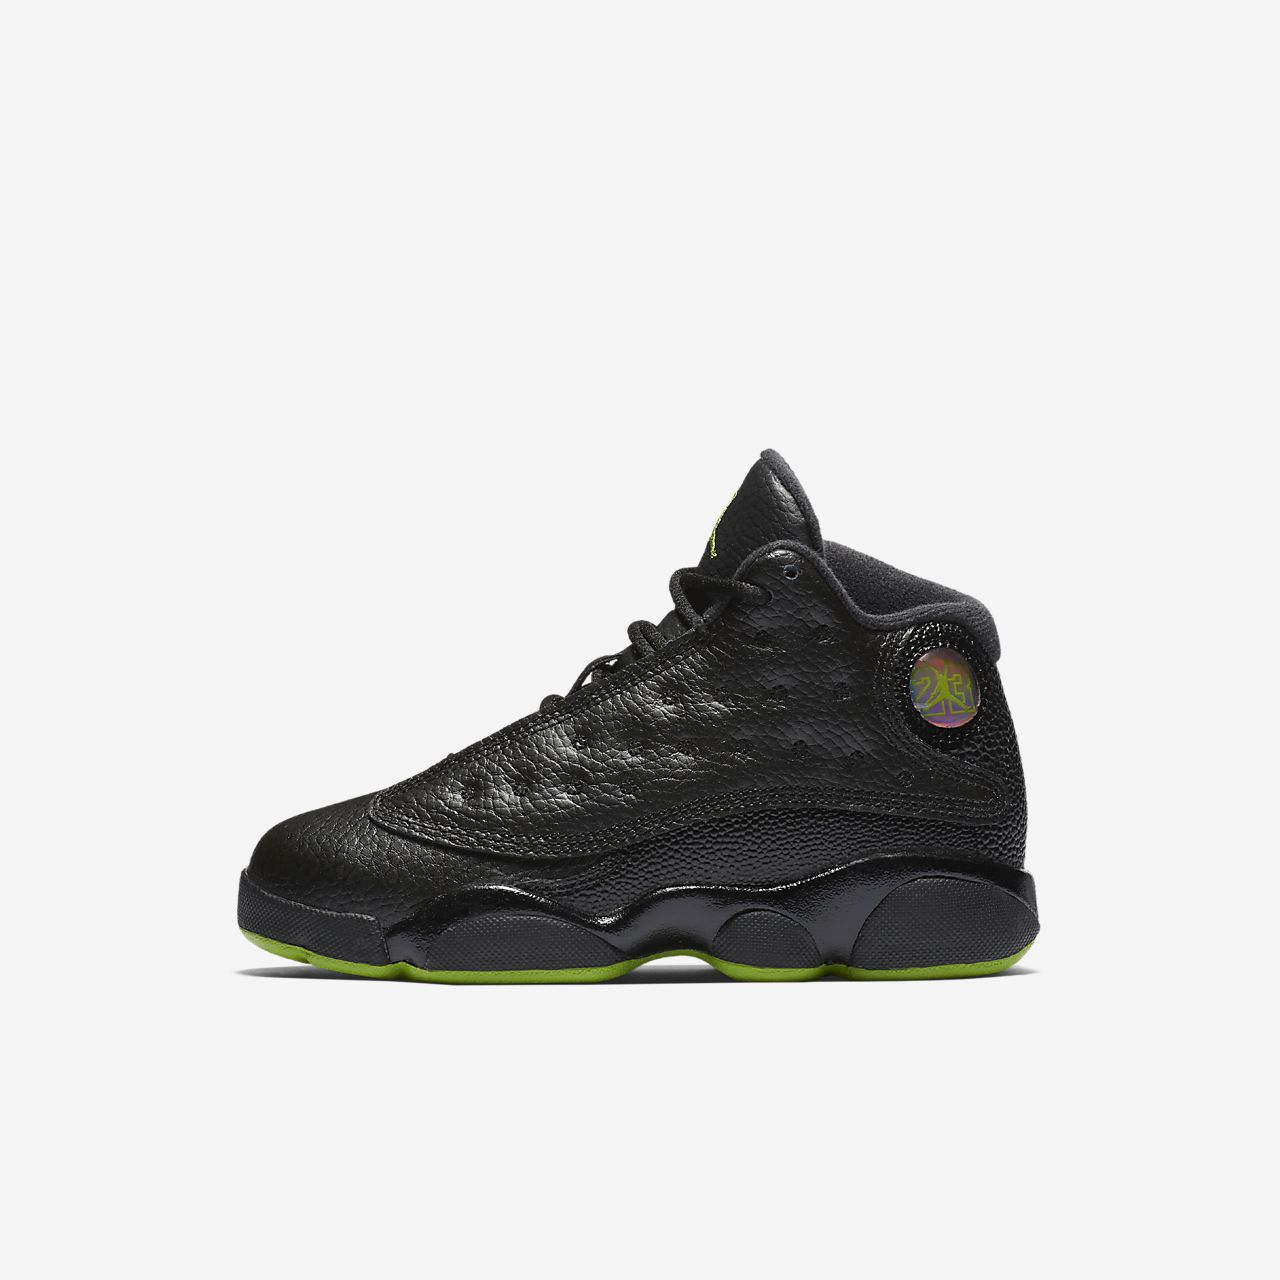 Jordan 13 Retro |Younger Kids' Shoe